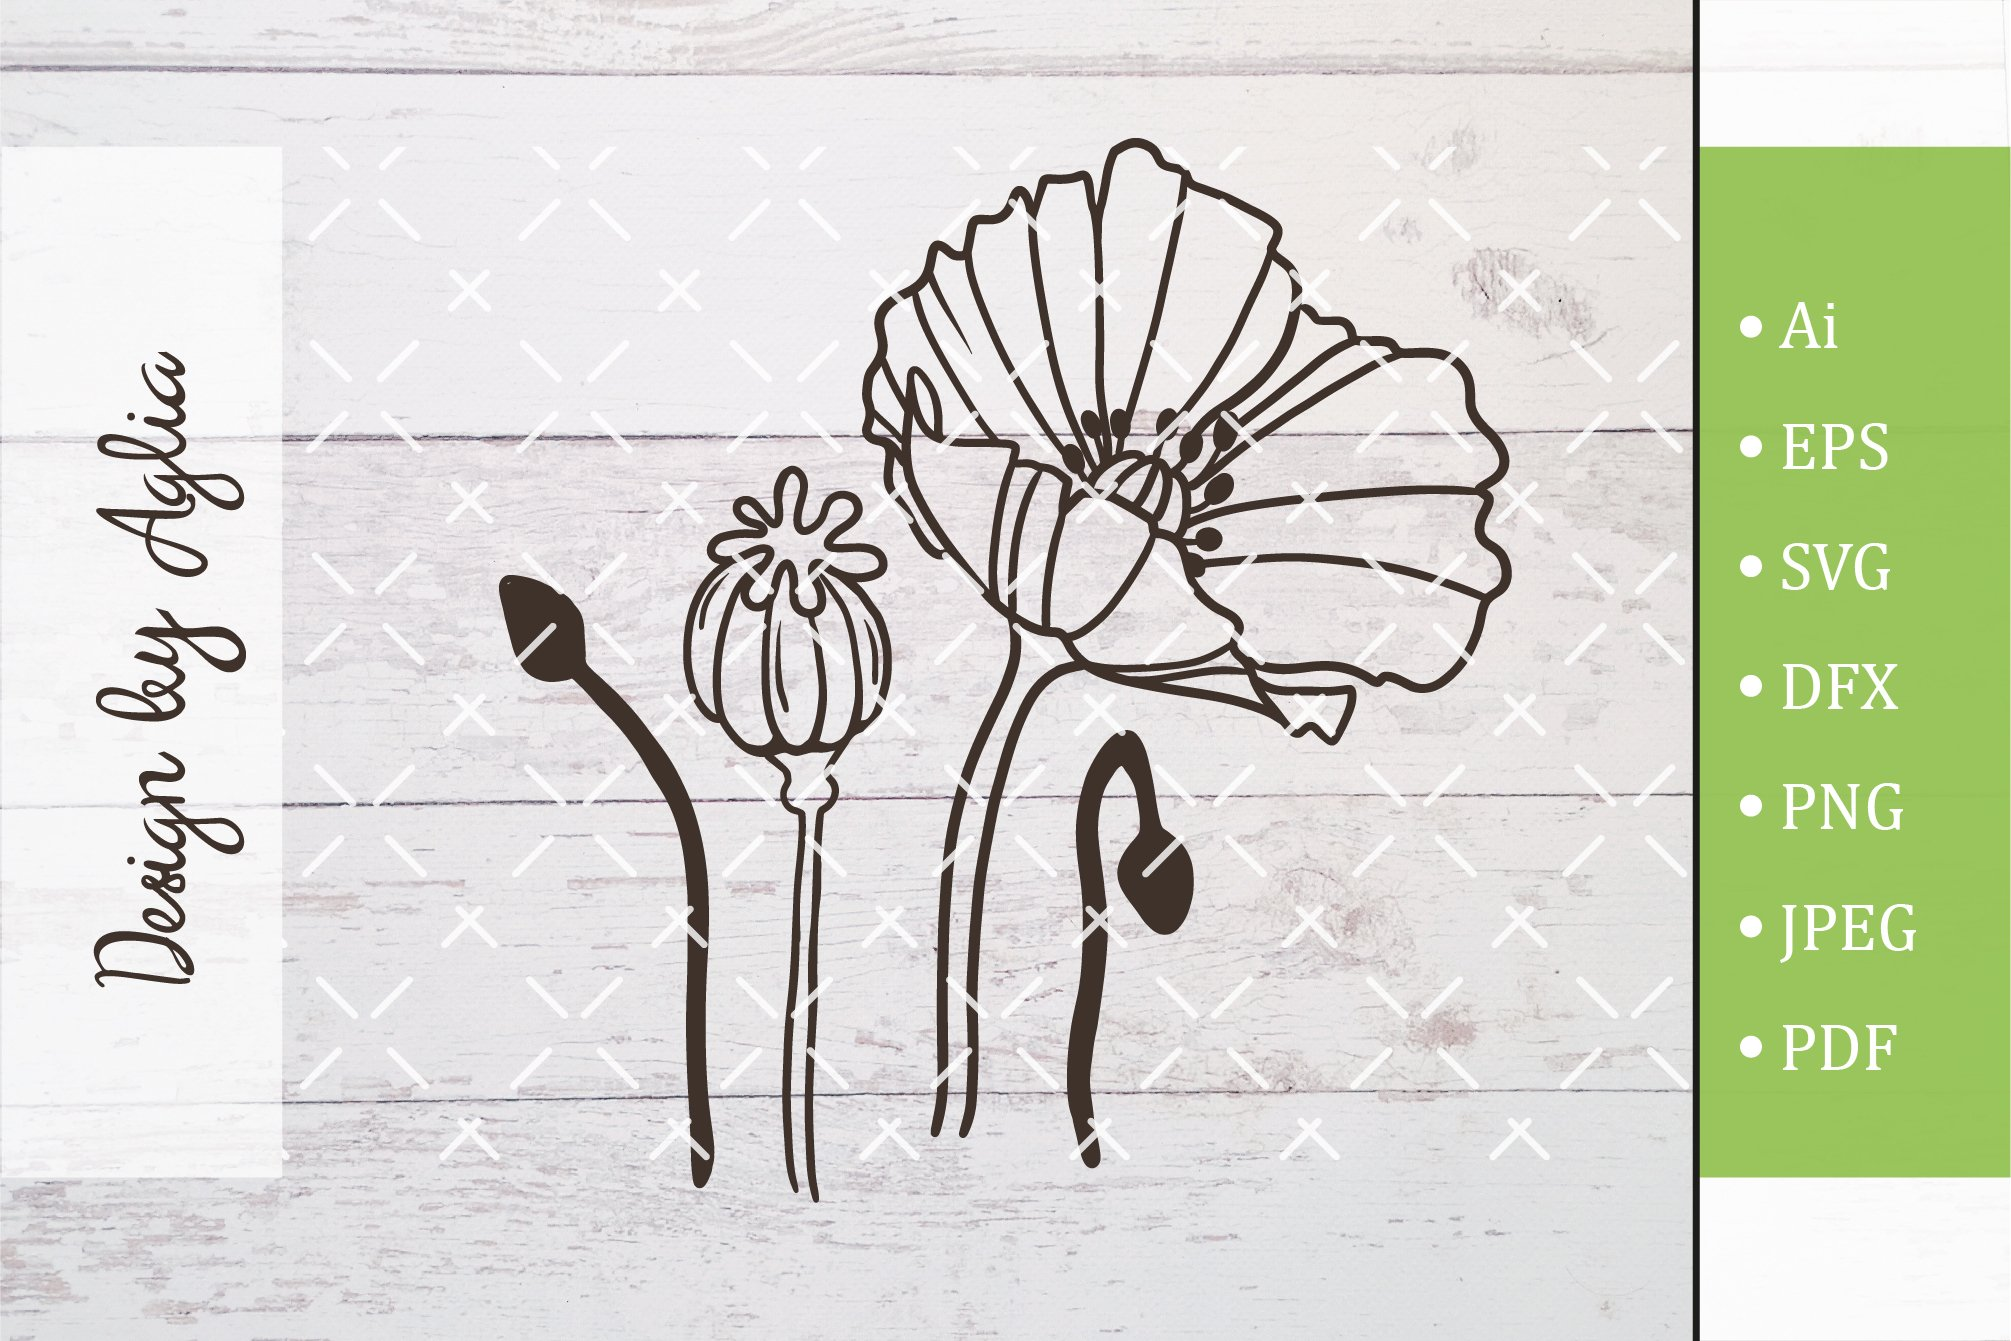 SVG flower poppy, Cut file, Line art illustration example image 1